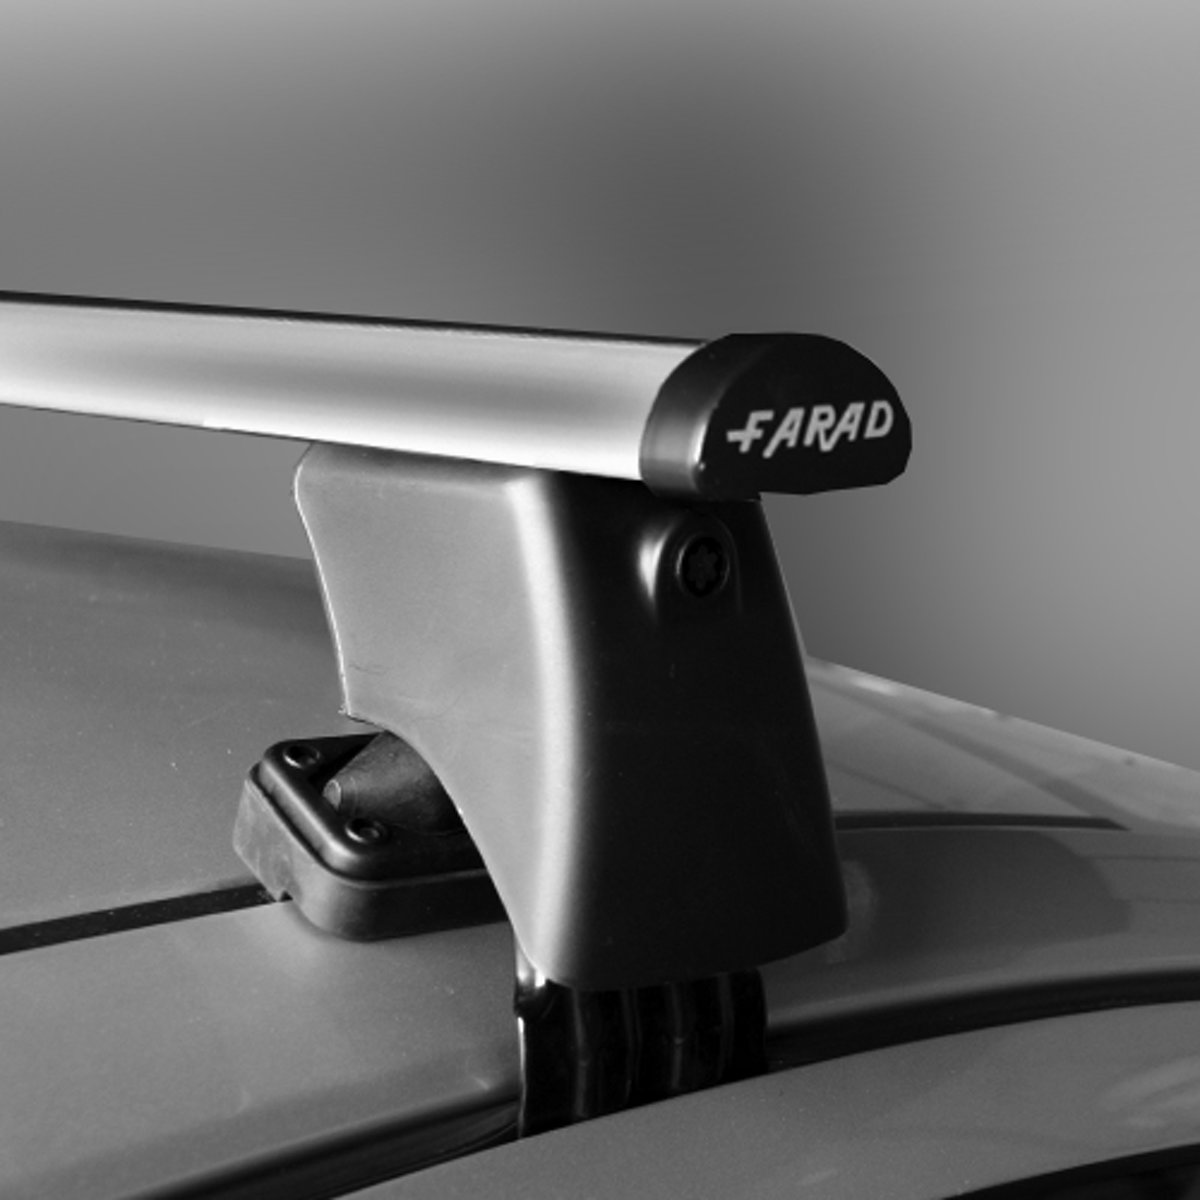 Dakdragers Bmw X2 SUV vanaf 2018 - Farad aluminium kopen